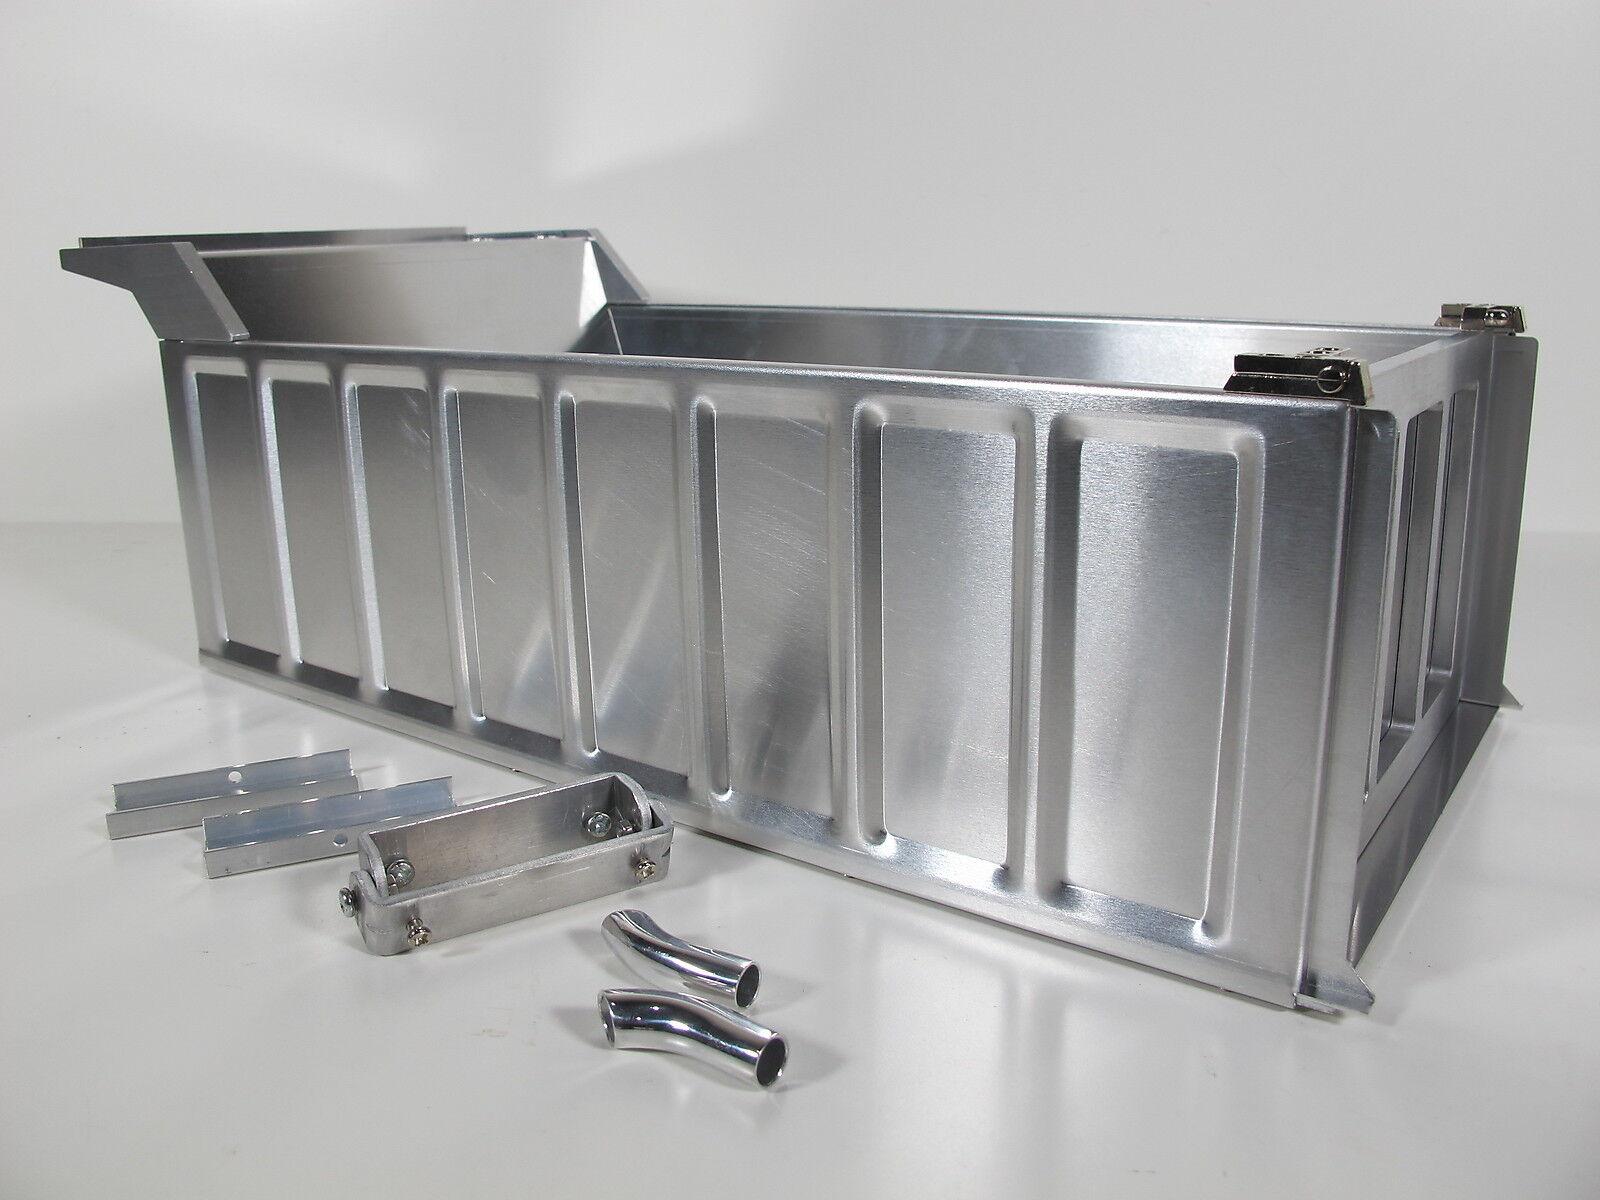 Nuovo Custom Aluminum Dump Bed Tipper Conversion Kit Tamiya 1/14 King Grand Hauler